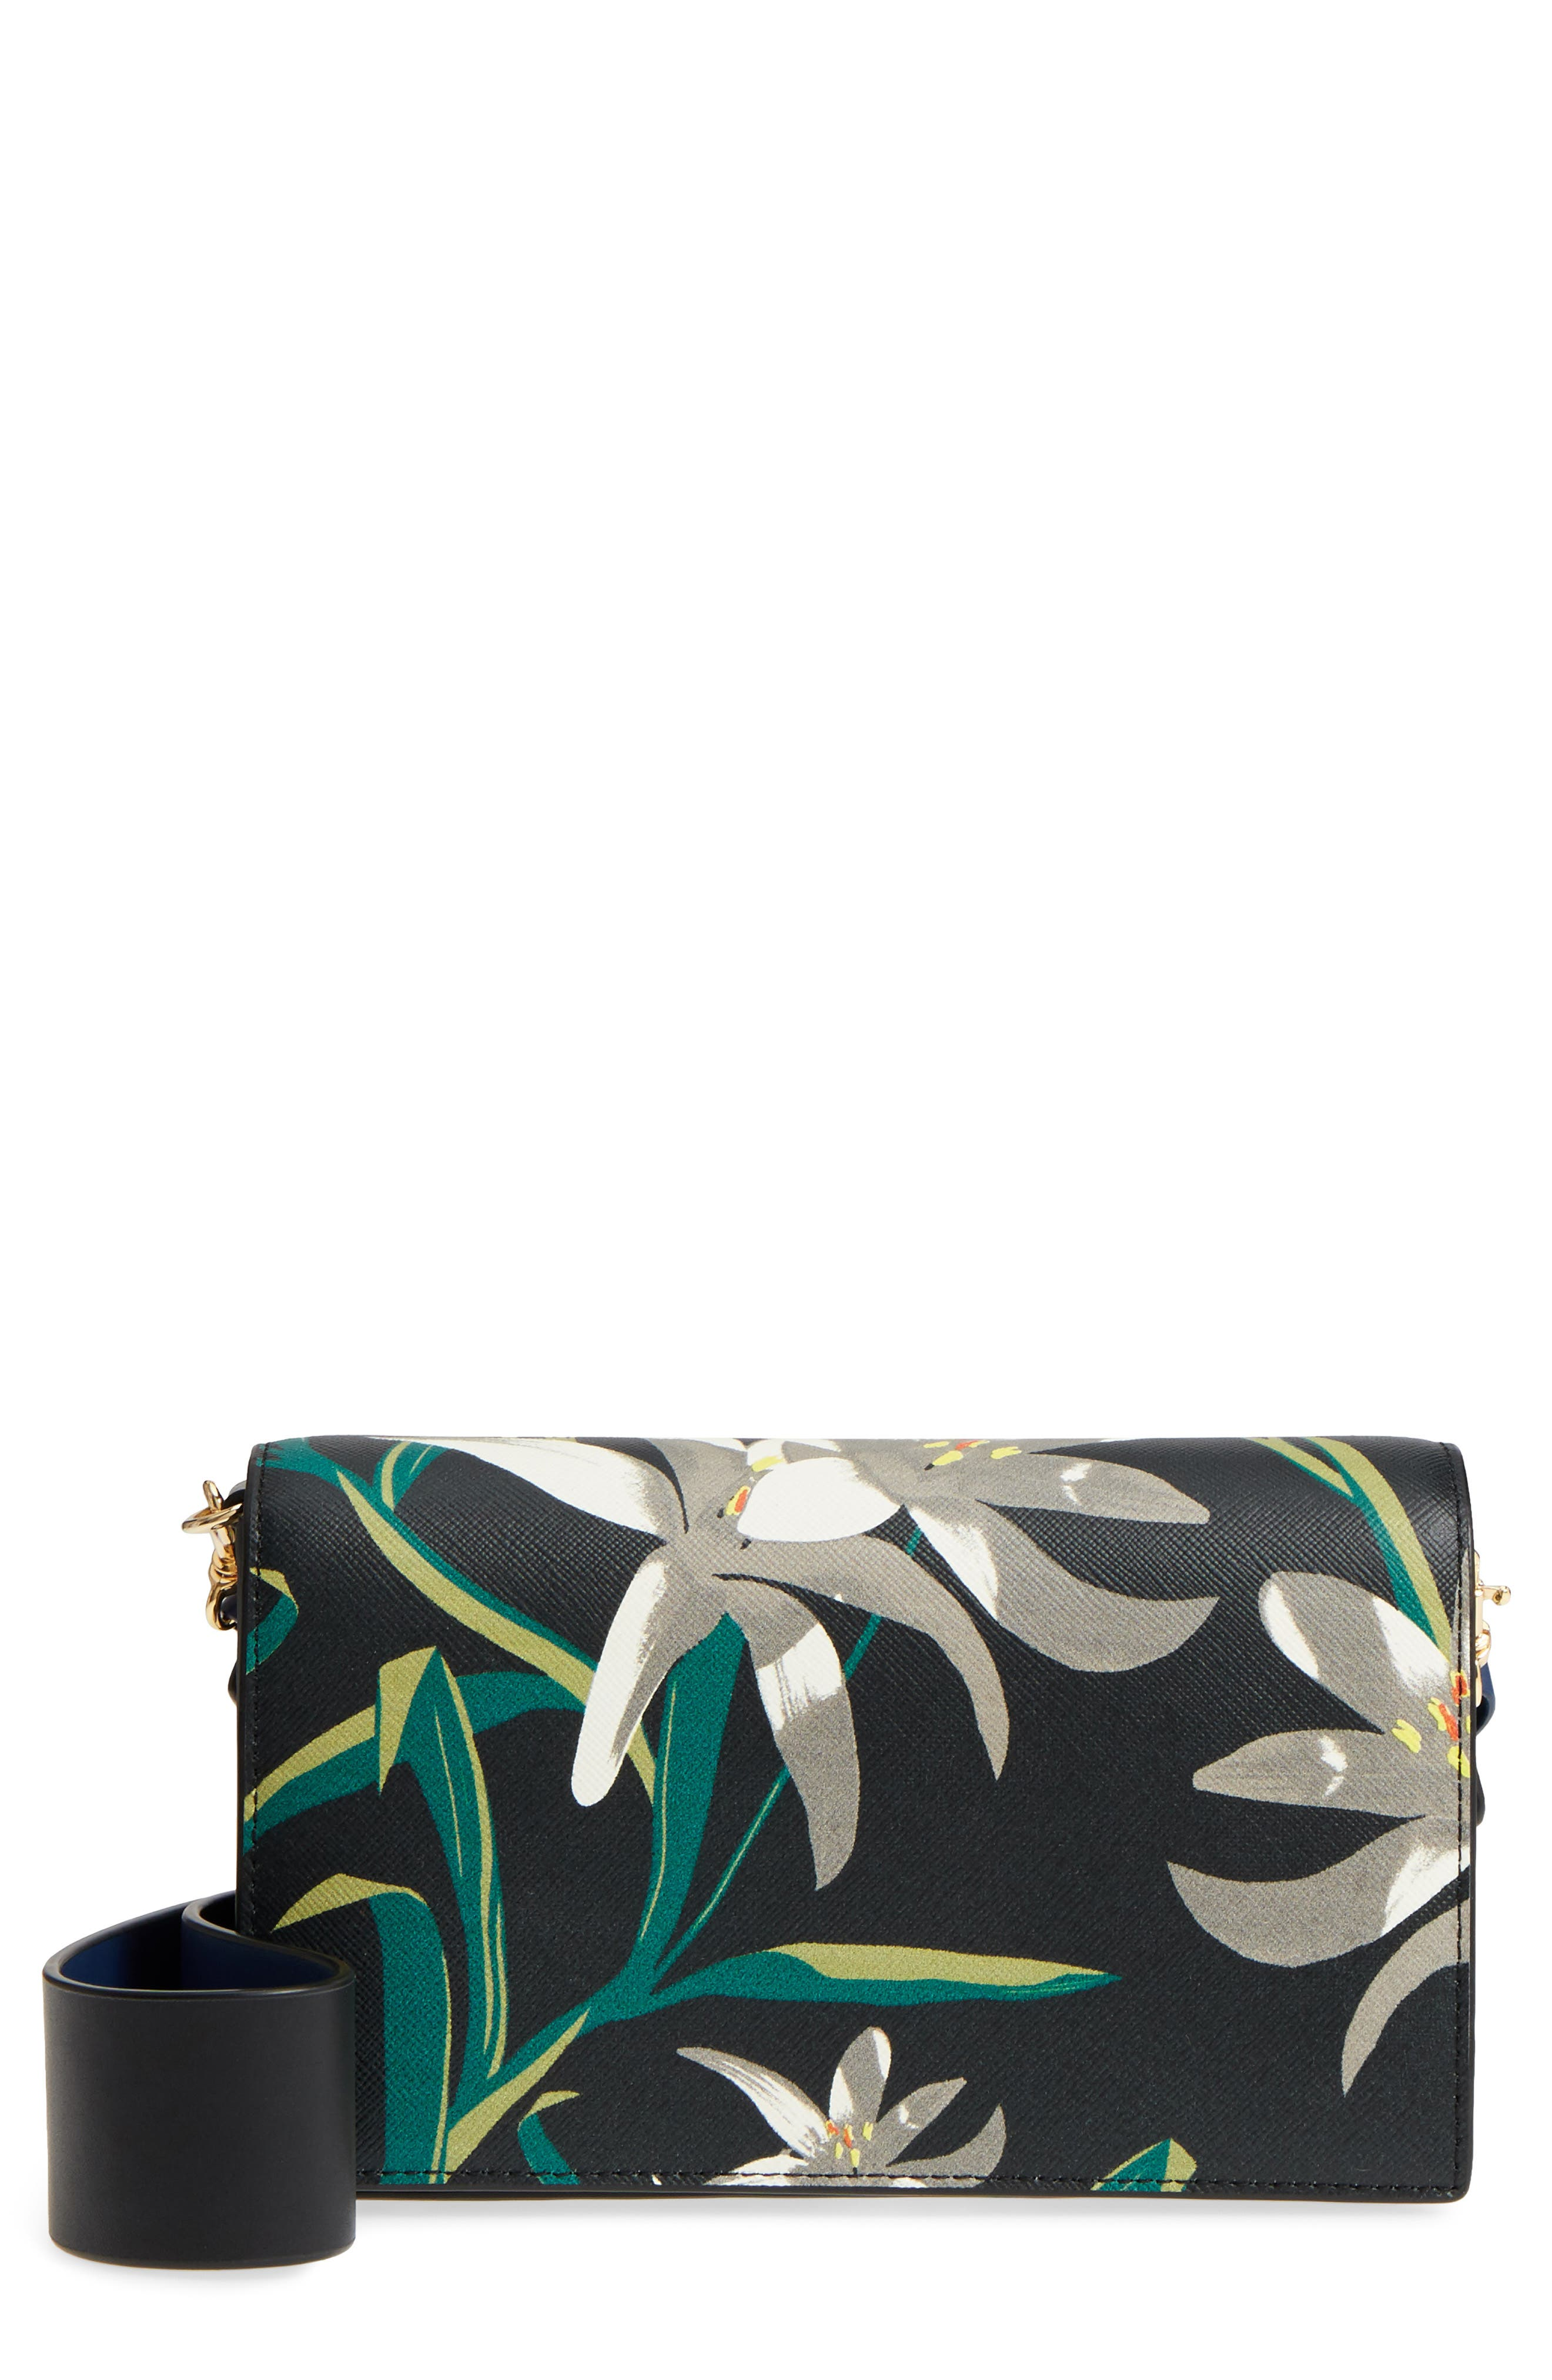 Soirée Leather Convertible Crossbody Bag,                         Main,                         color, 001